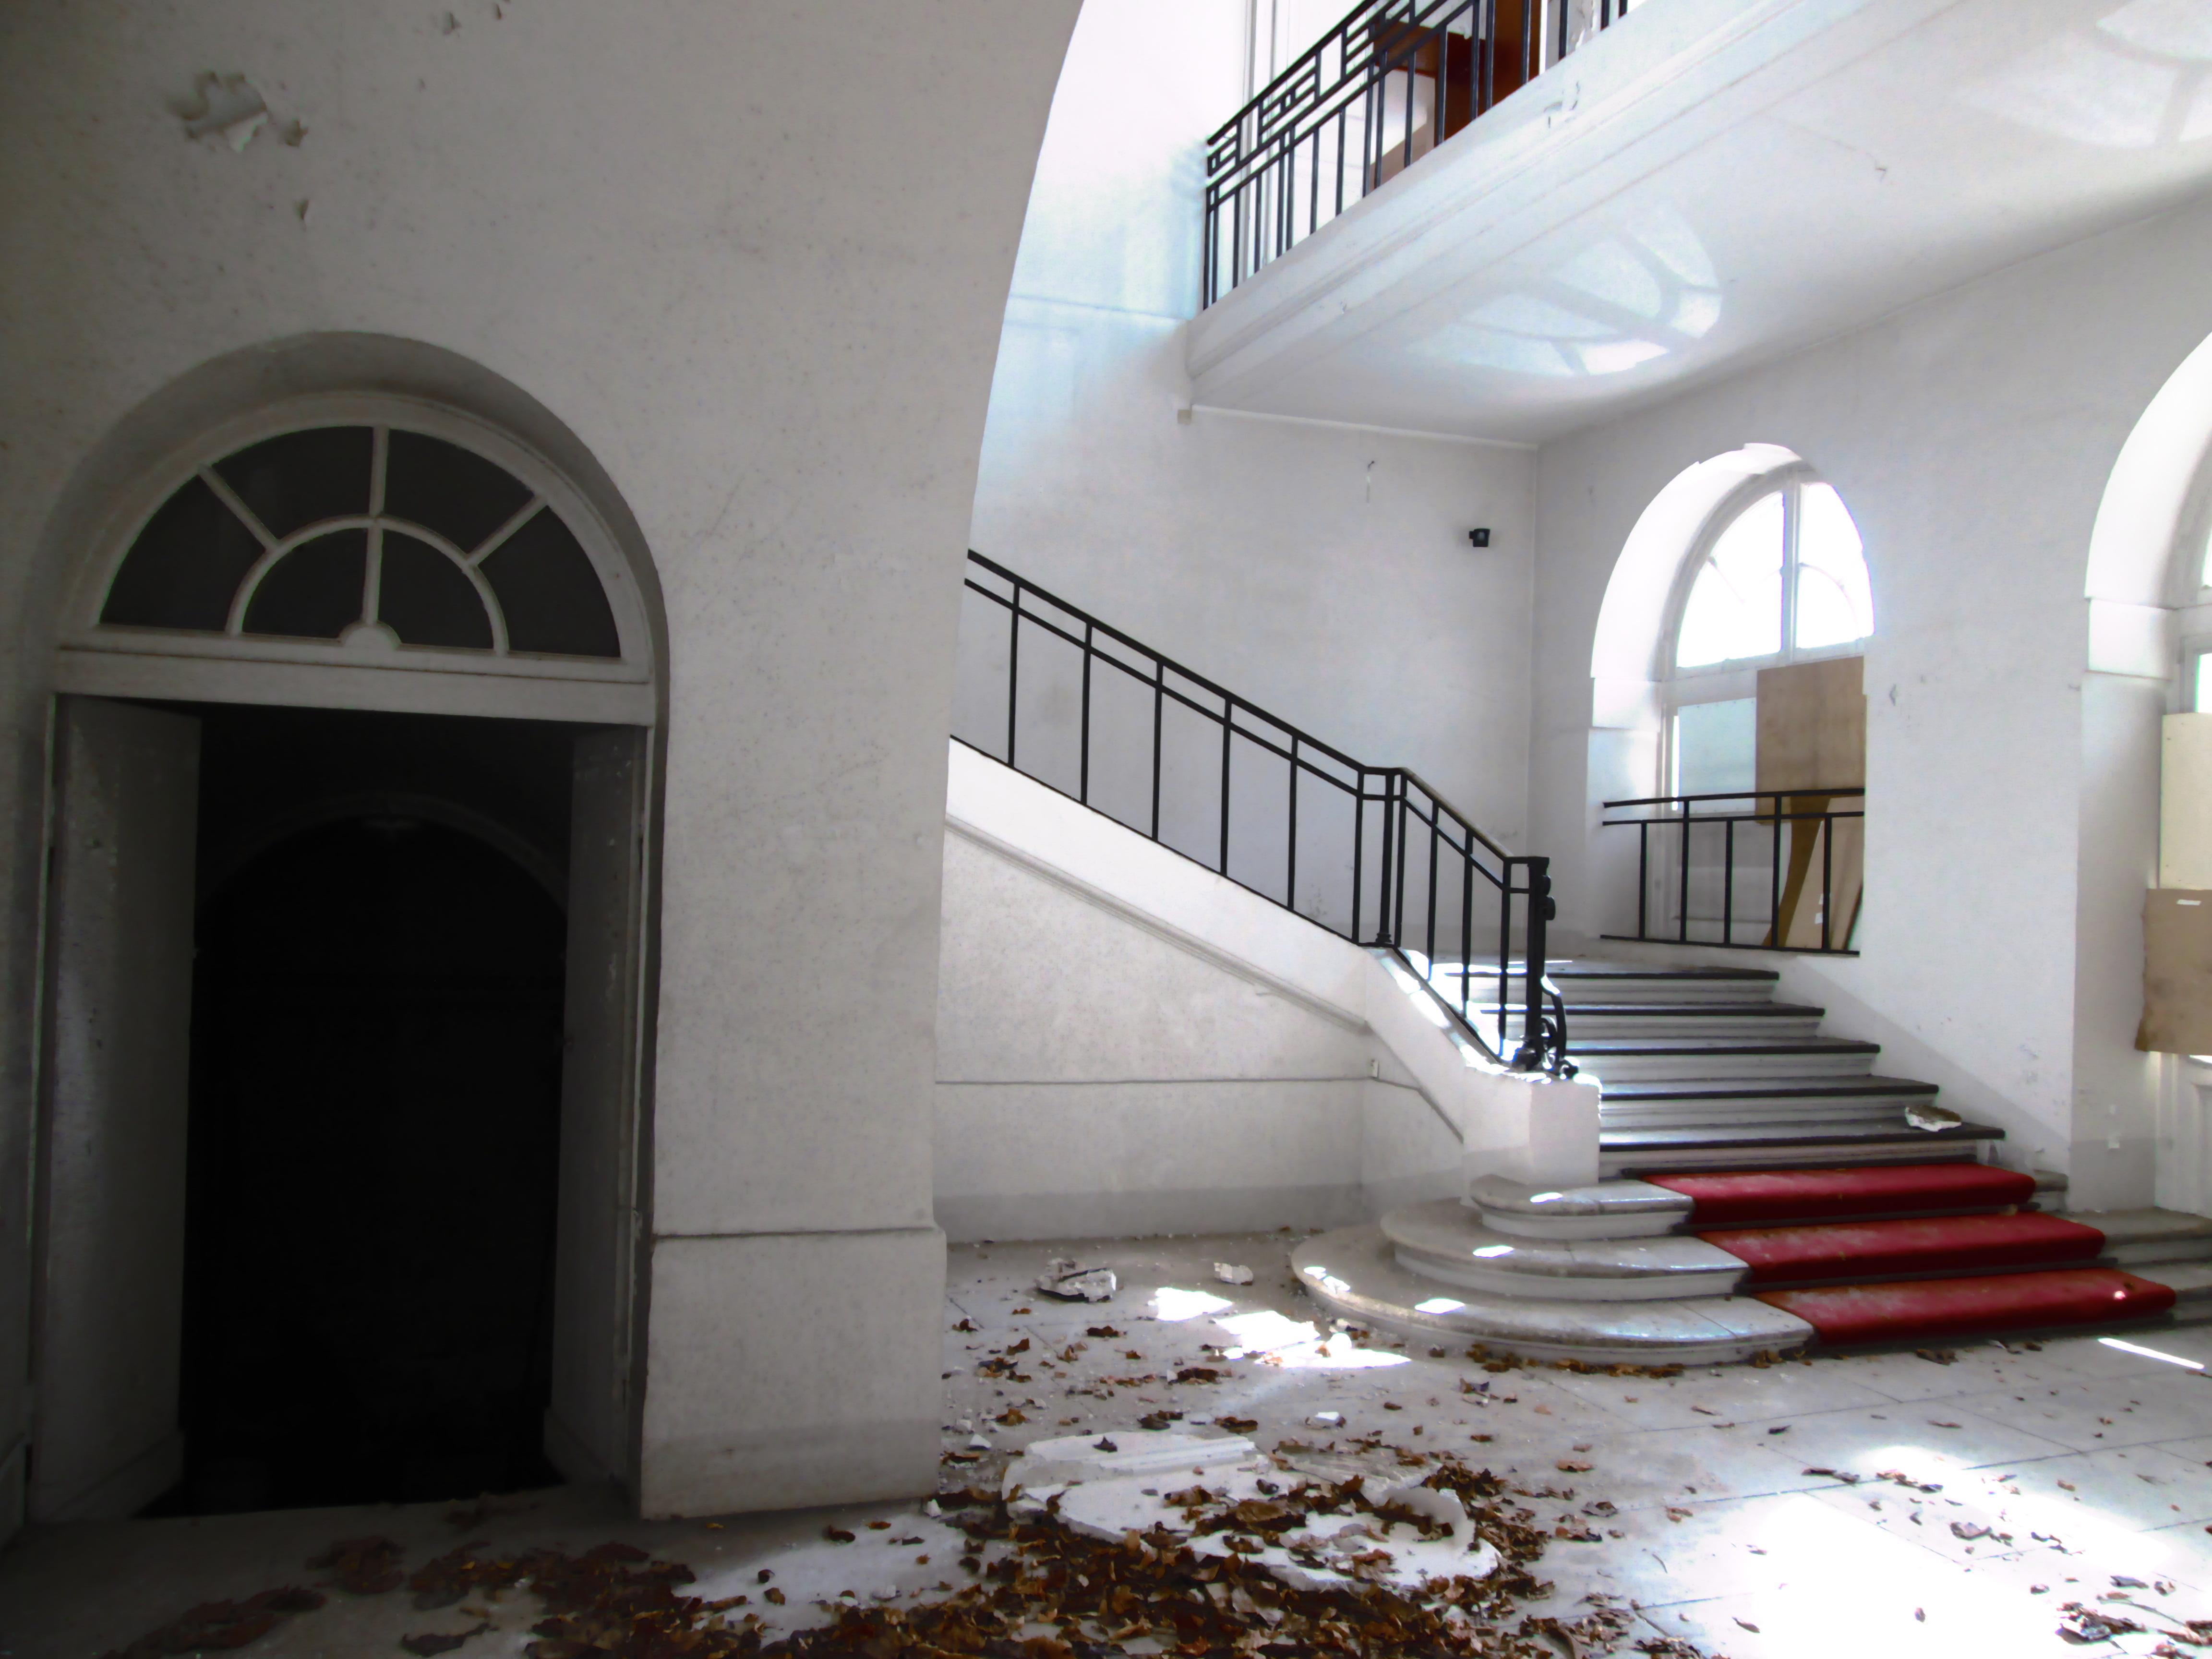 Escaliers Malraux Versailles 2015